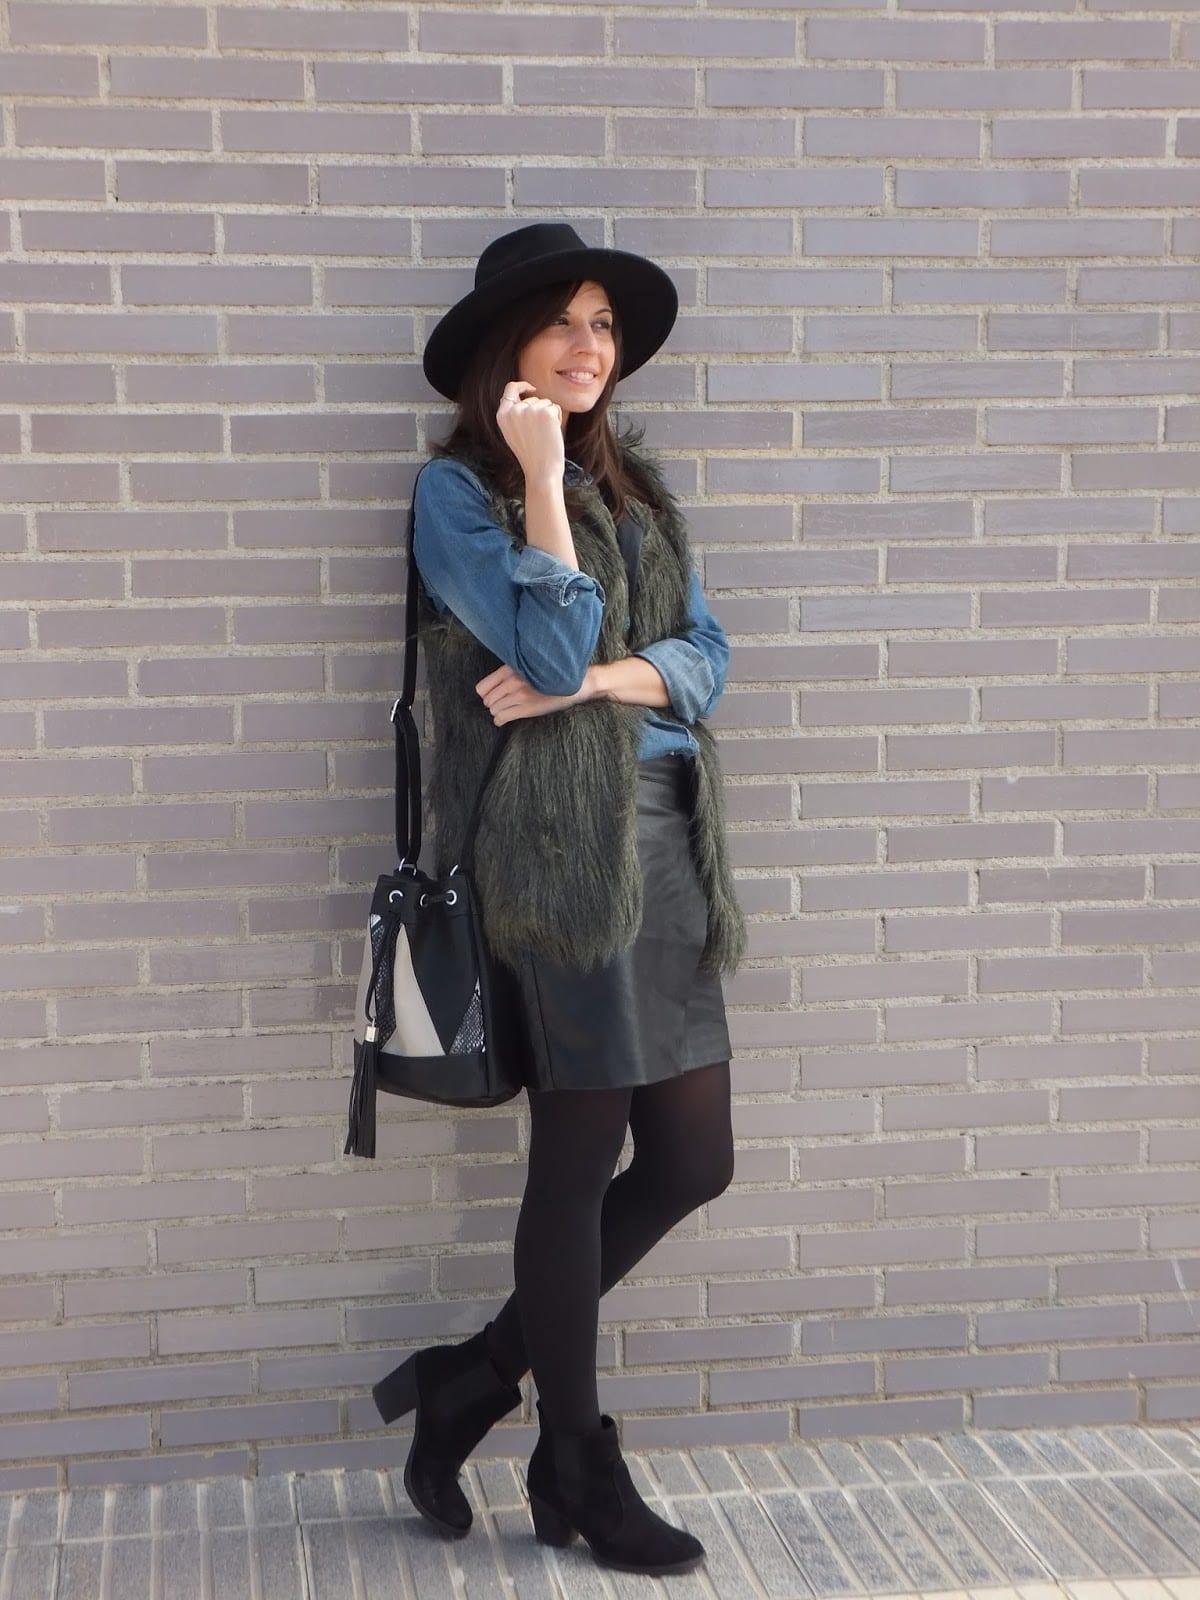 botas chelsea chaleco pelo suite blanco sombrero fedora bolso saco